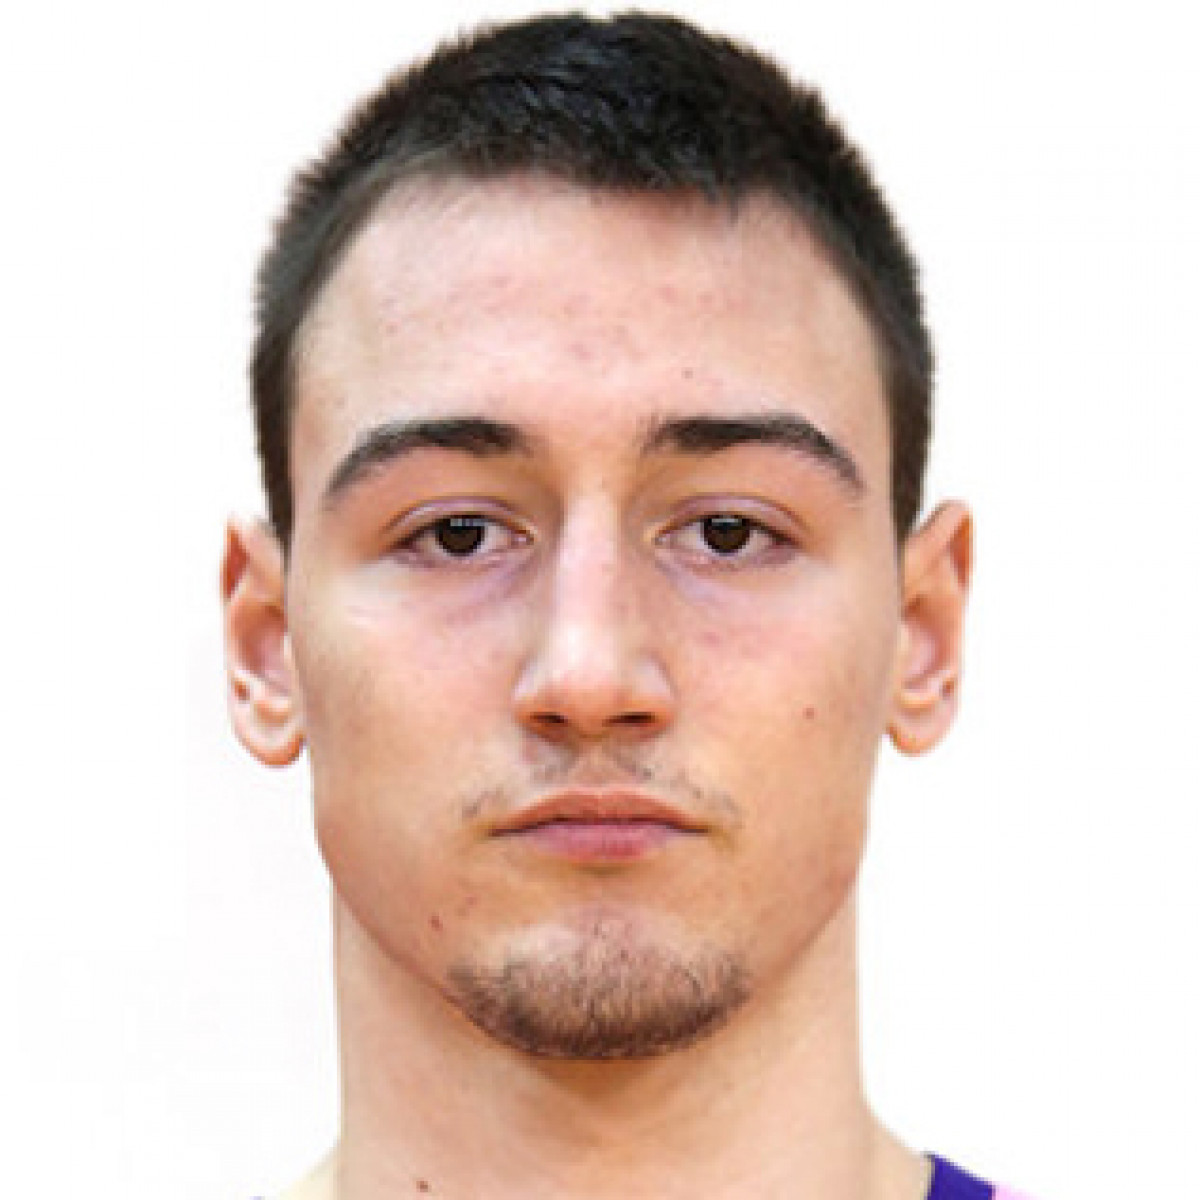 Aleksandar Pantelic